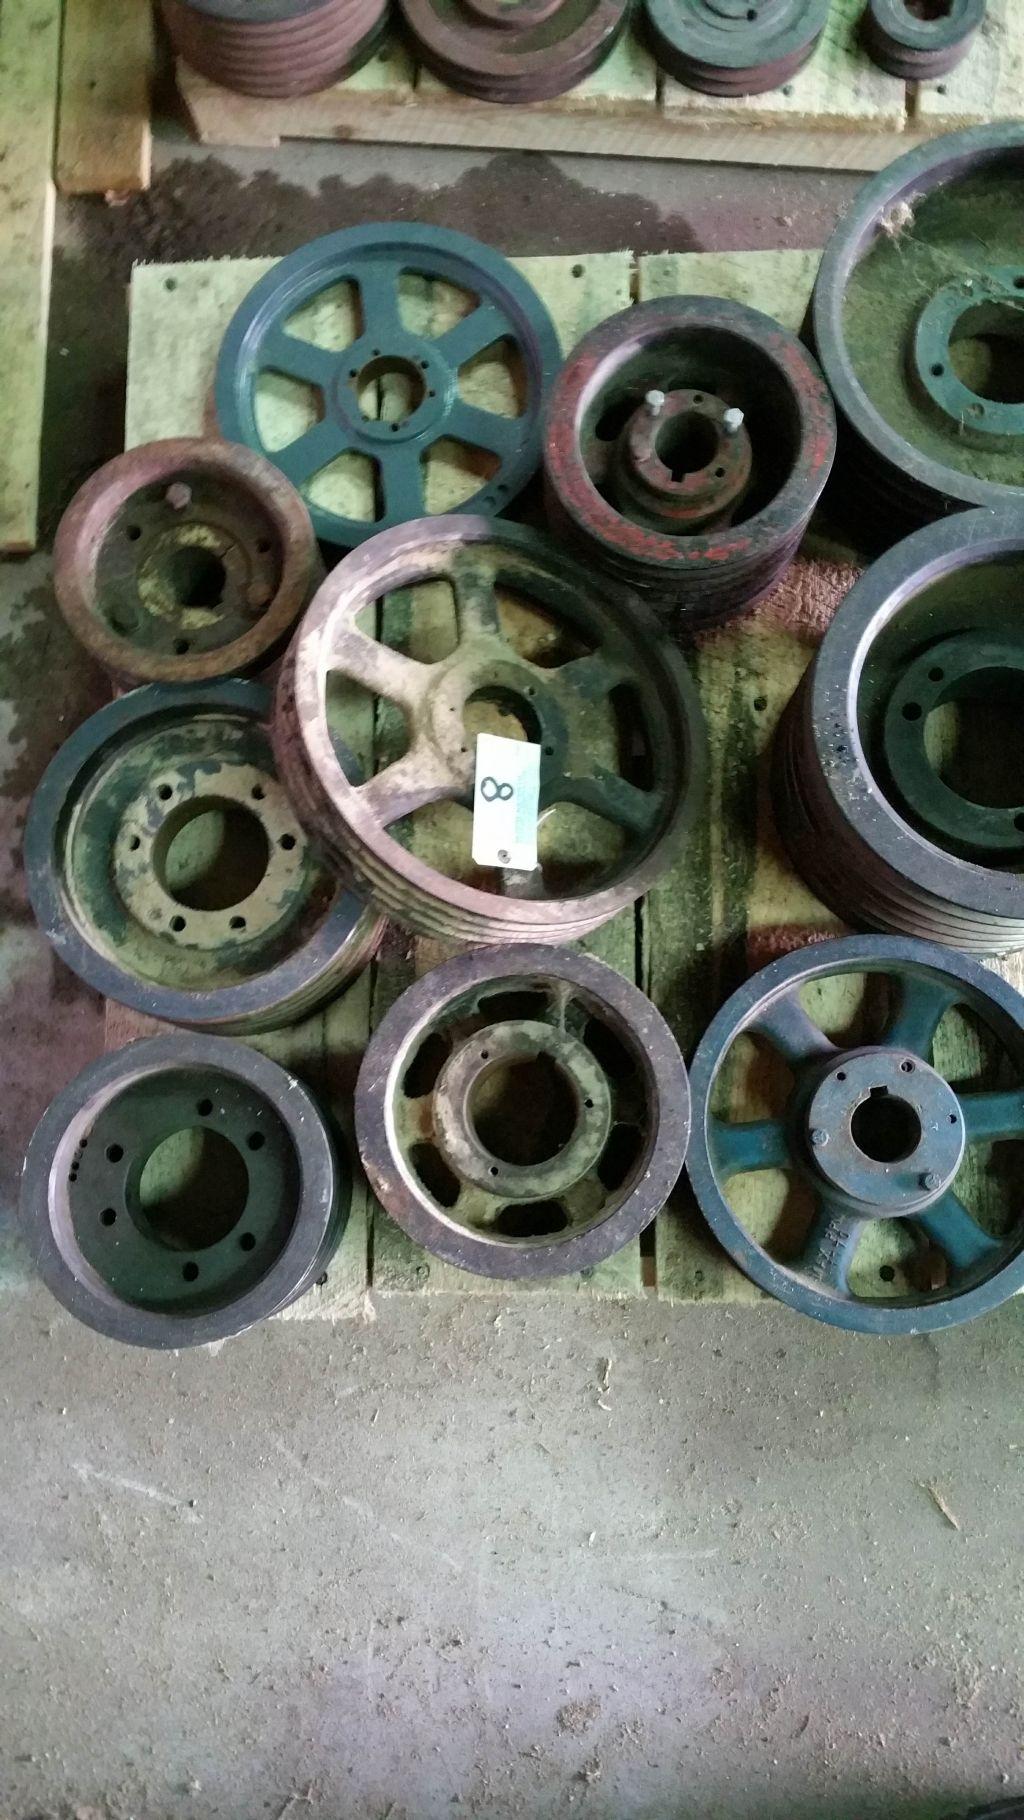 Lot 008 - (9) Large sheave pulleys.